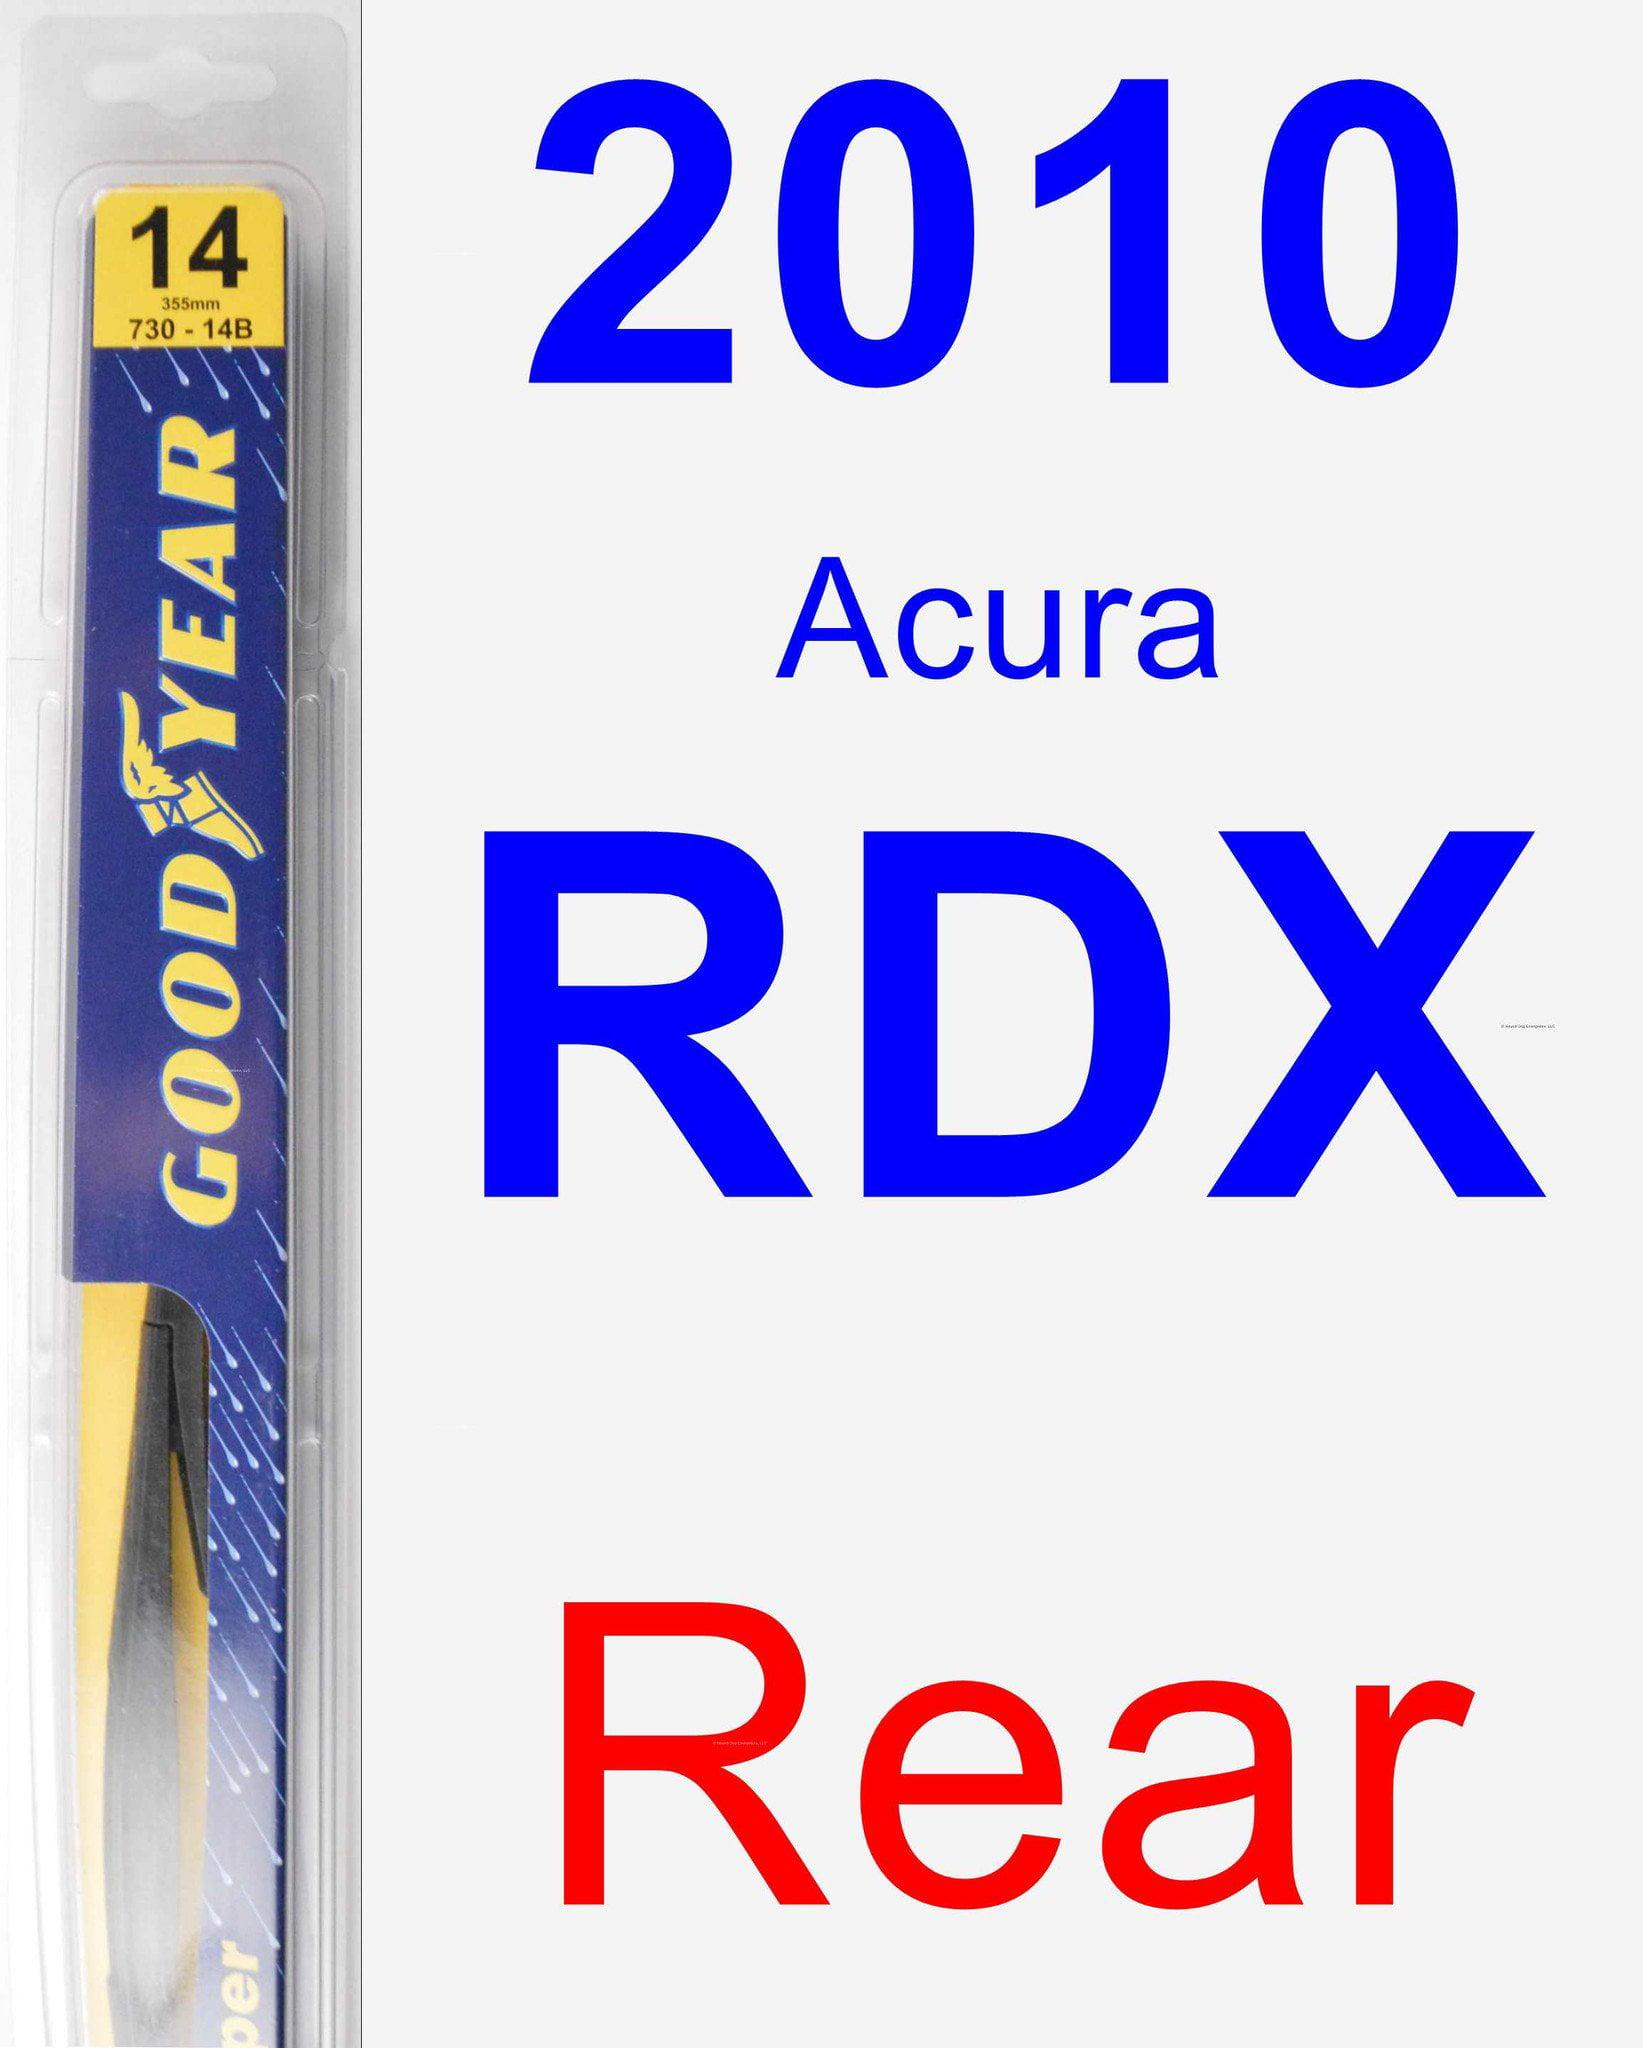 2010 Acura RDX Rear Wiper Blade